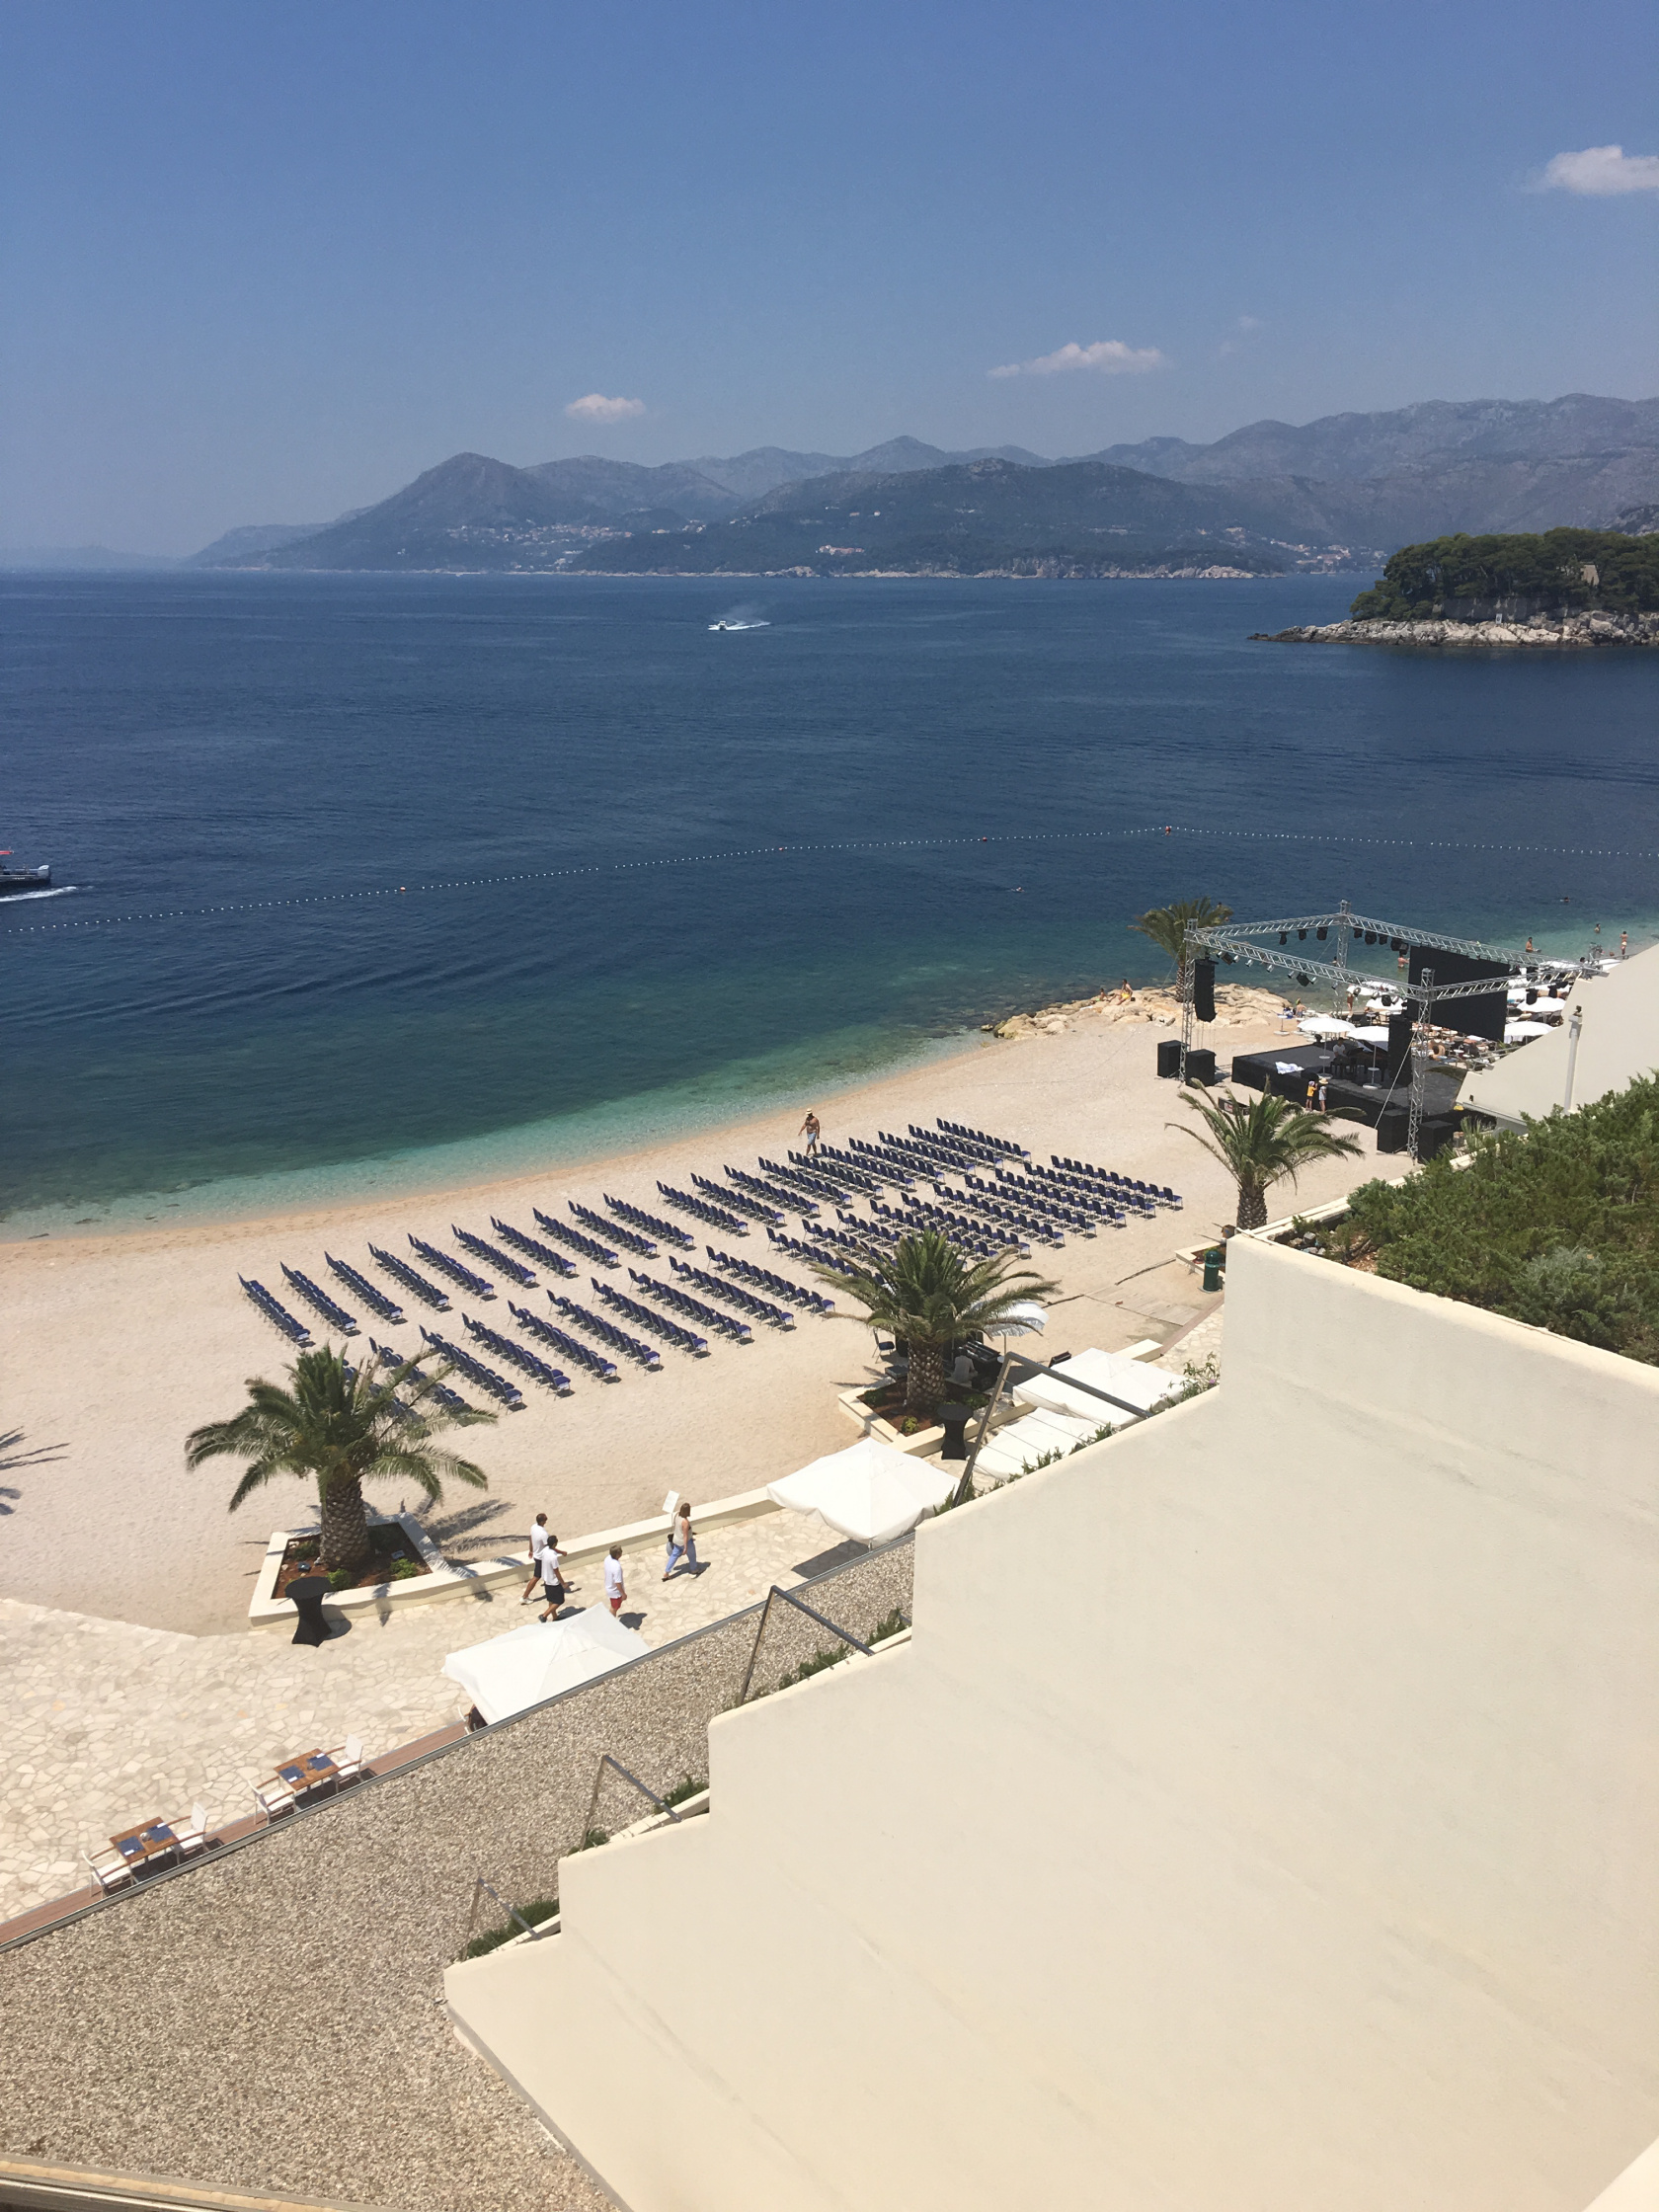 Maxim Mrvica's concert preparation on the beach